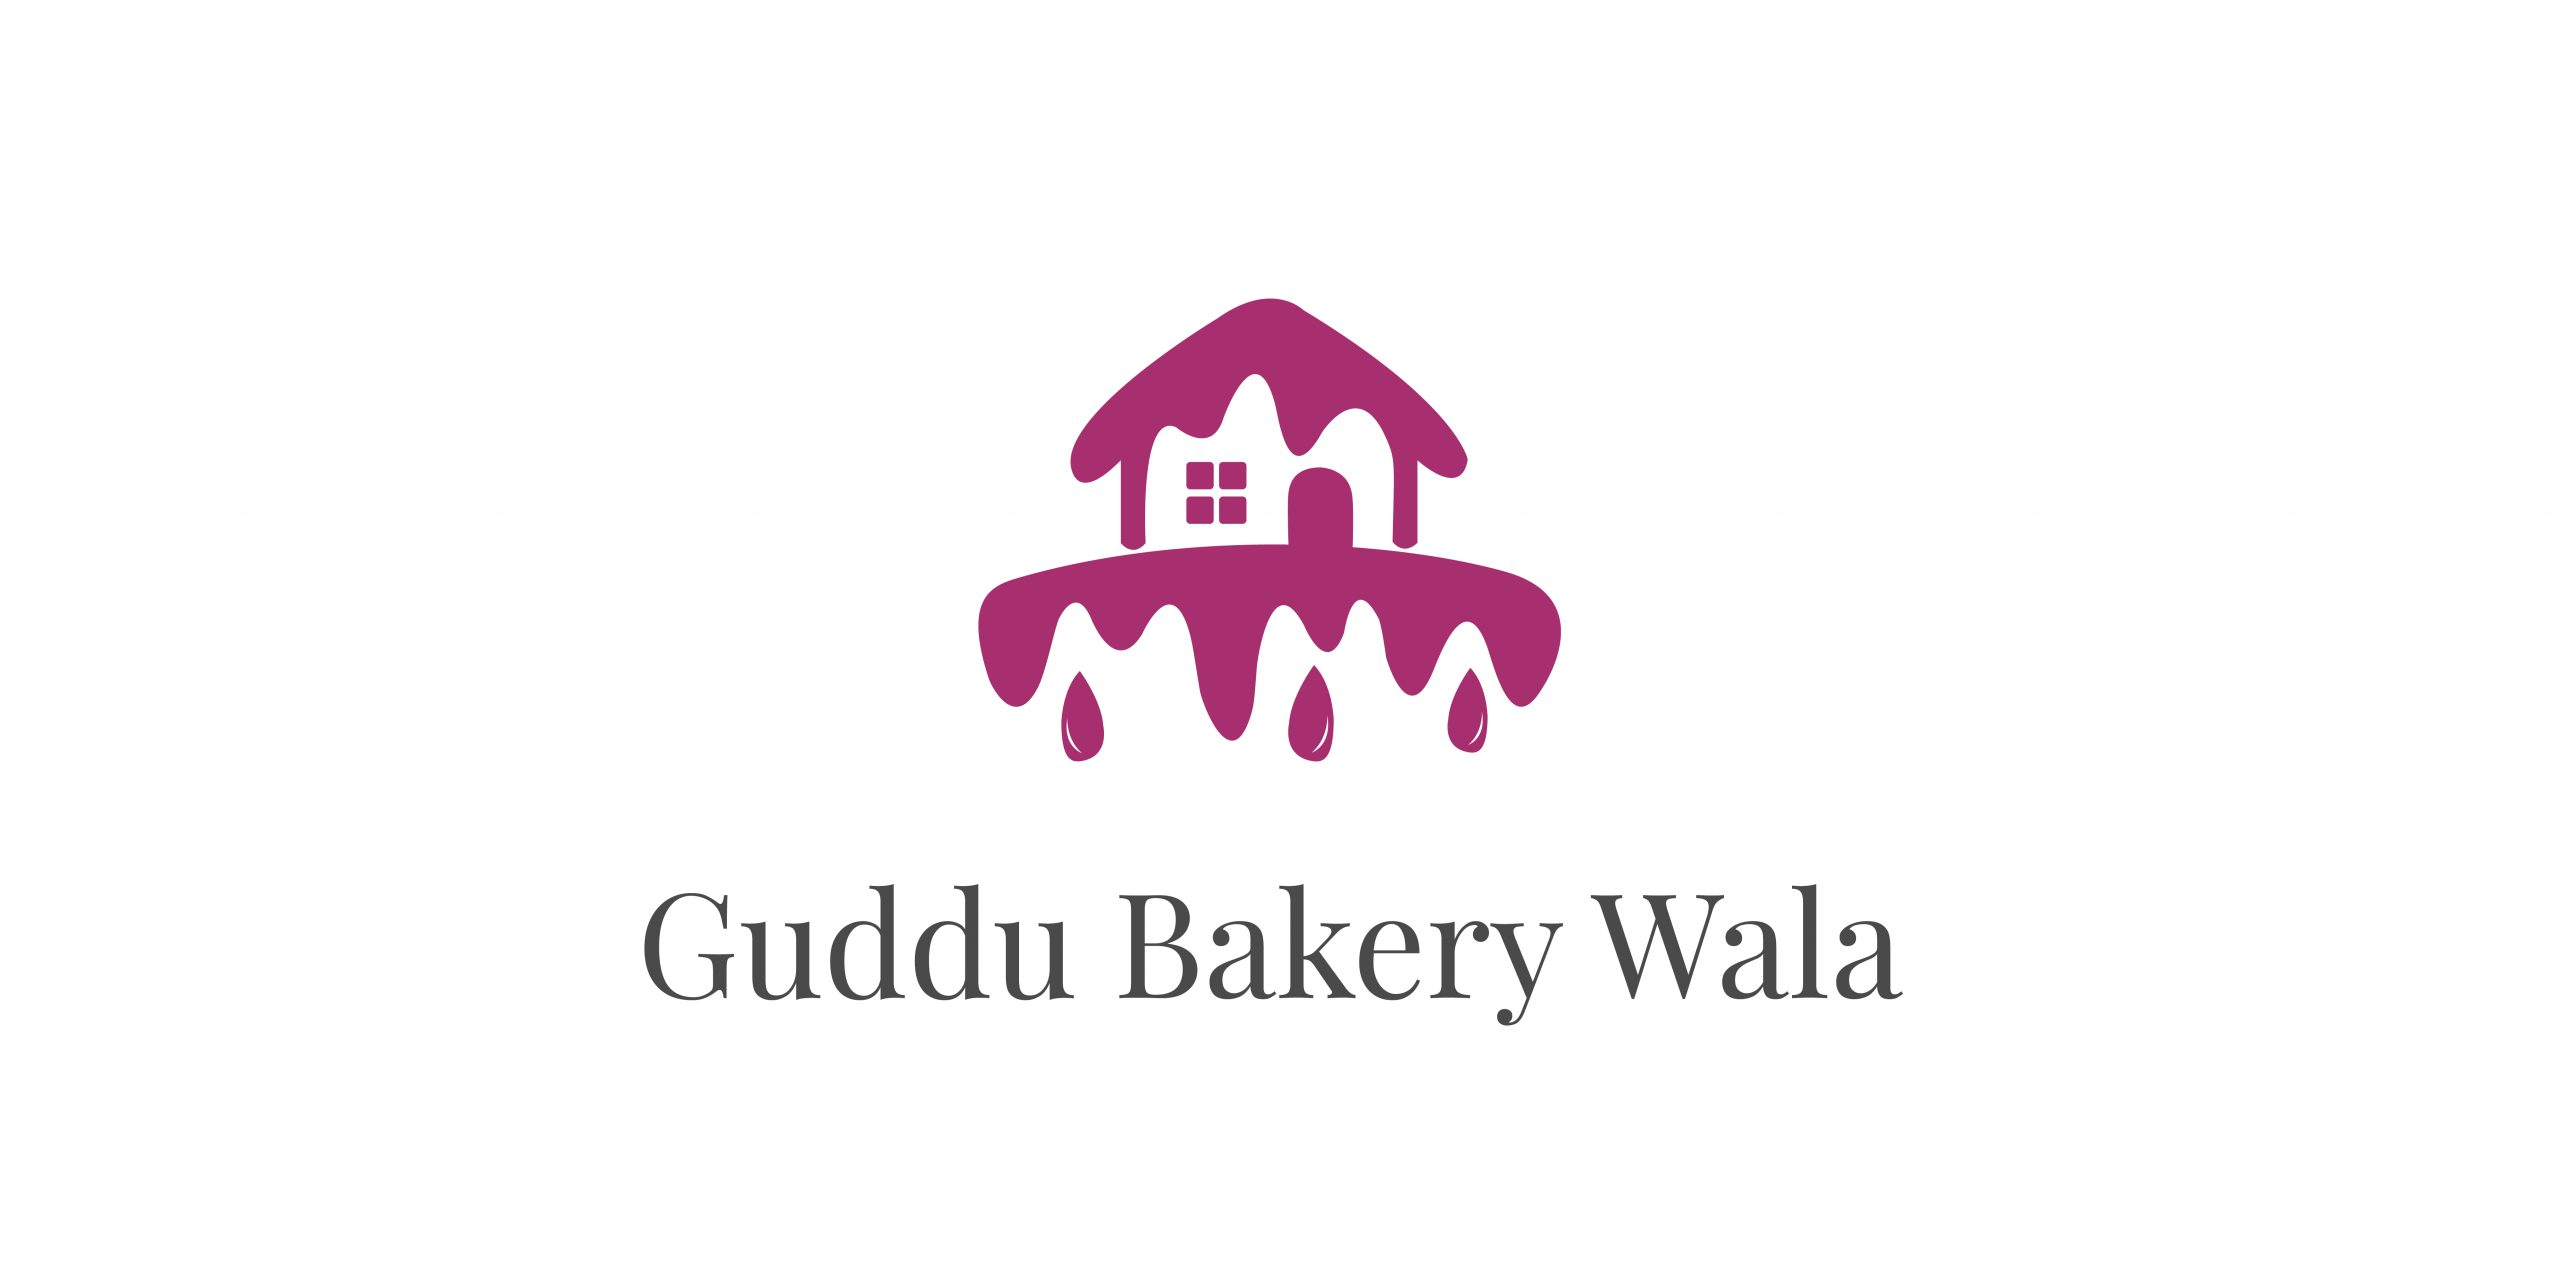 Guddu Bakery Wala